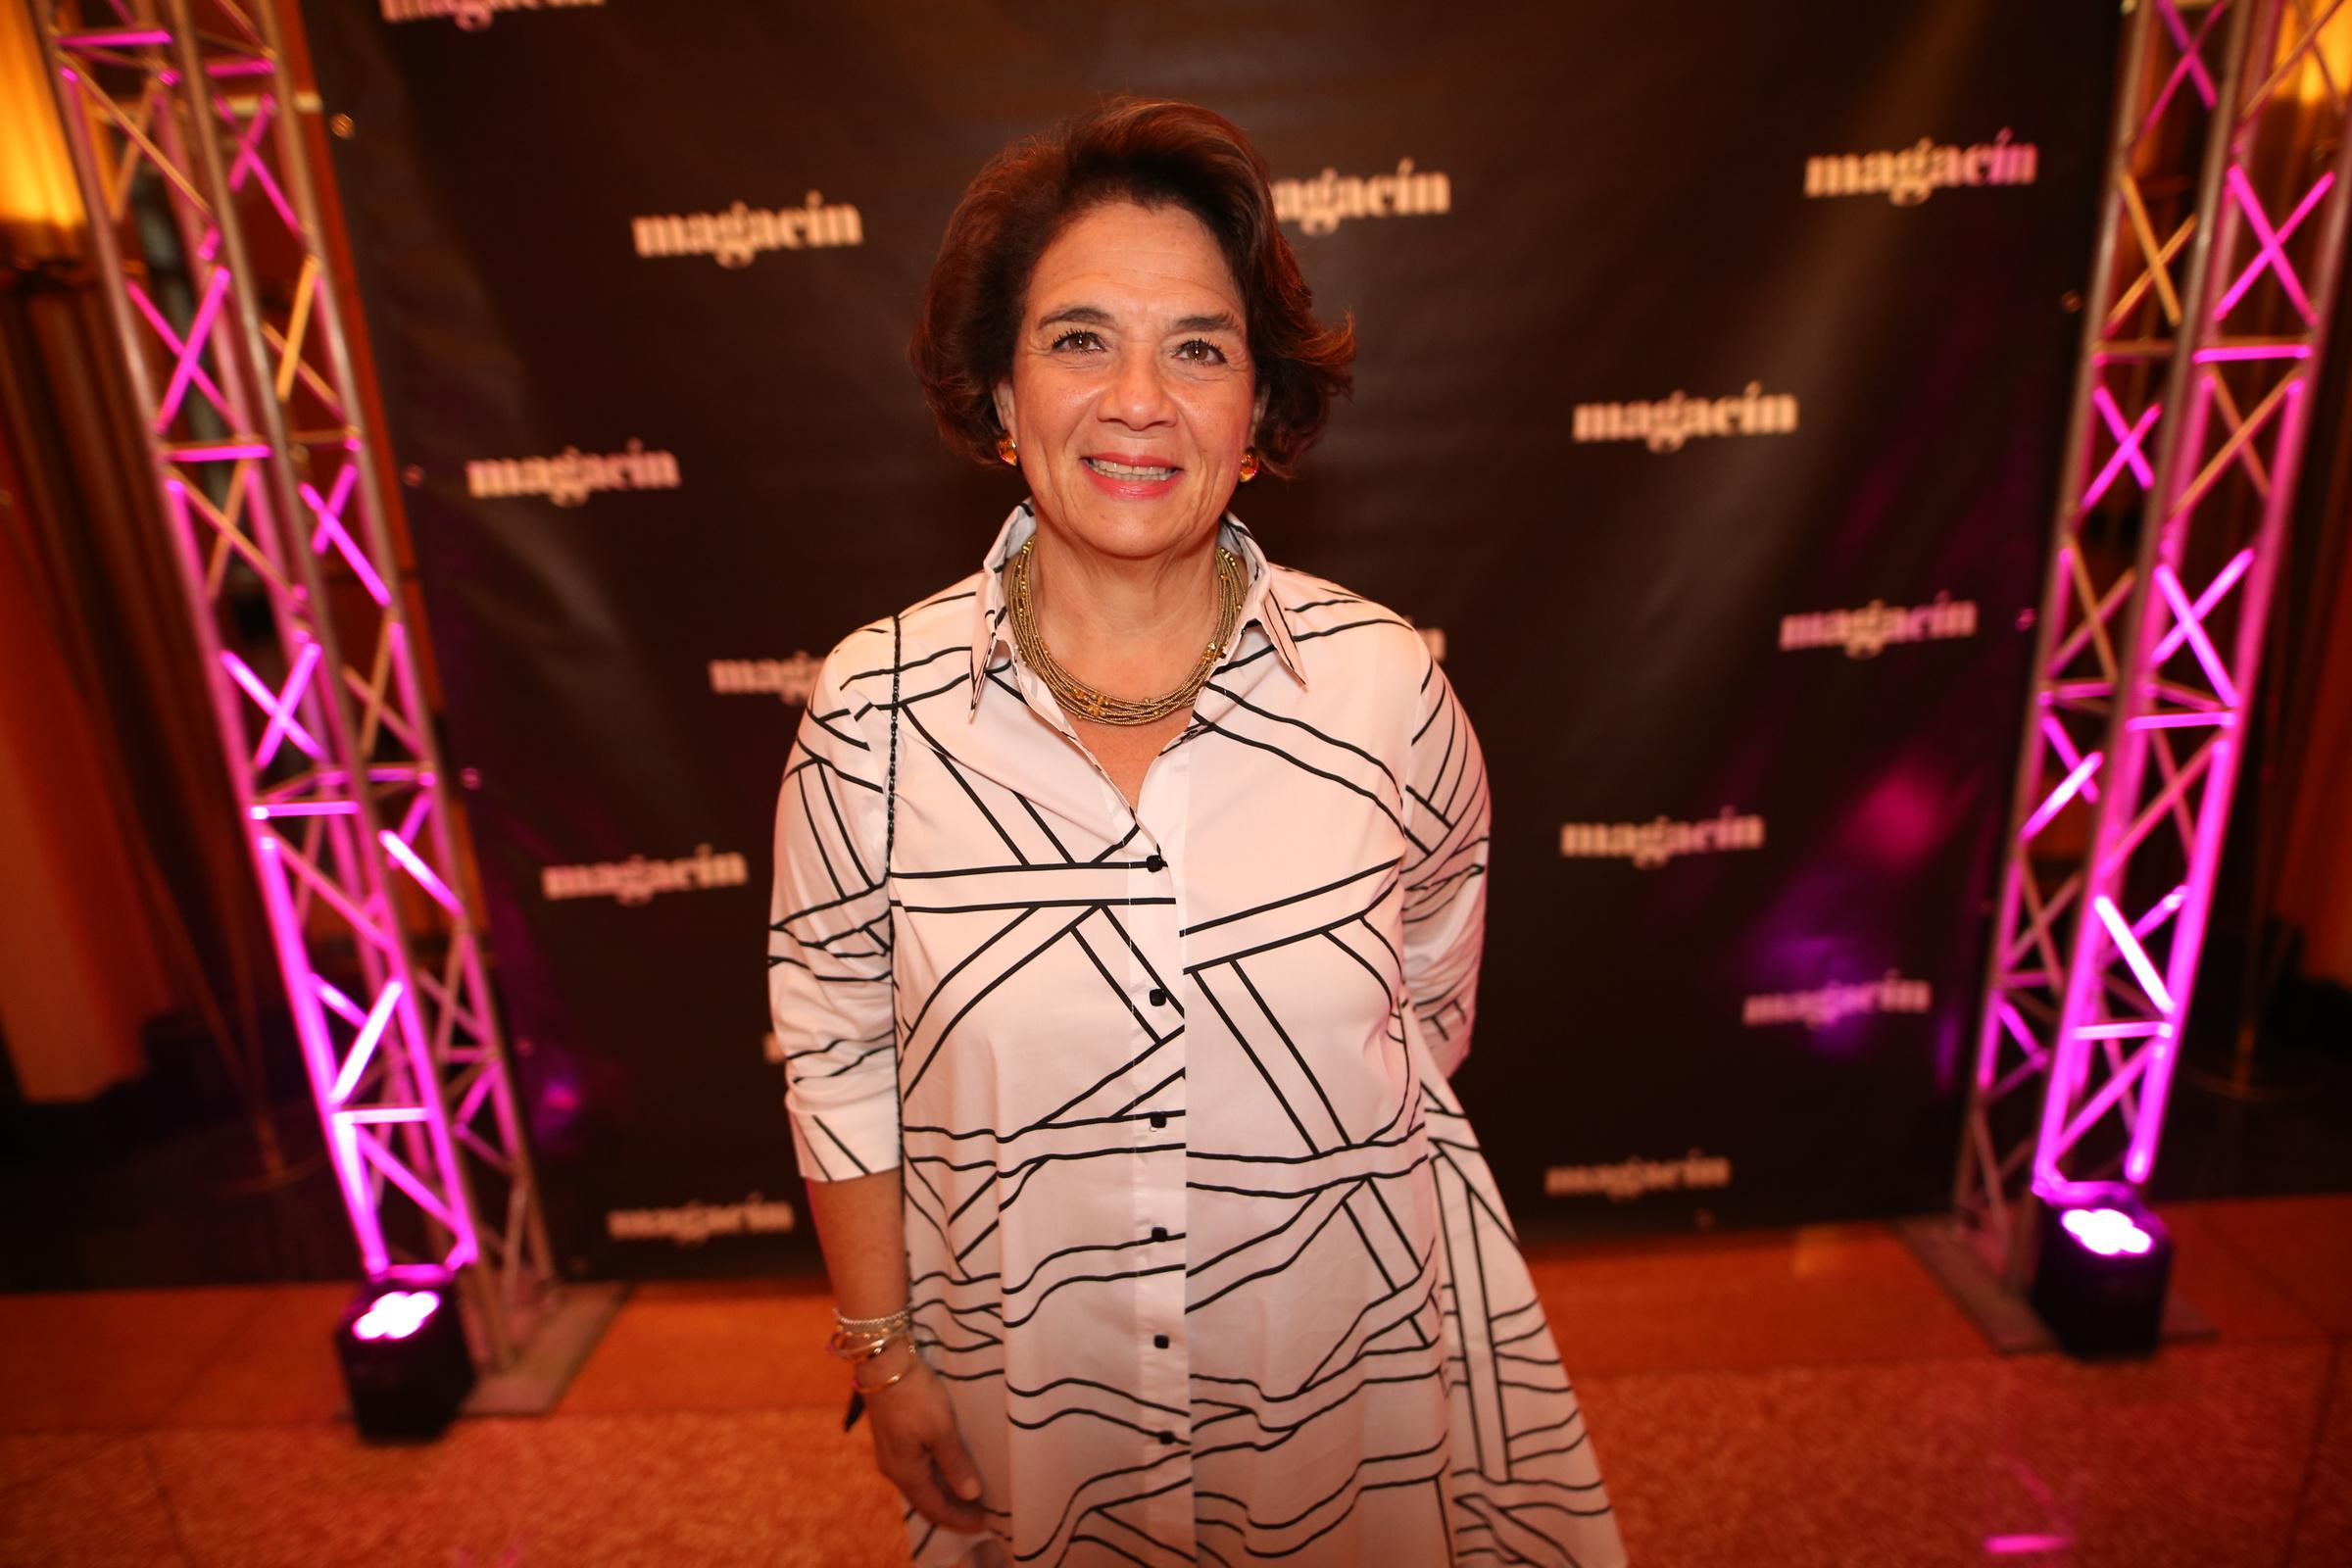 Marina Puello, vicepresidenta senior de Zenith Optimedia  (david.villafane@gfrmedia.com)